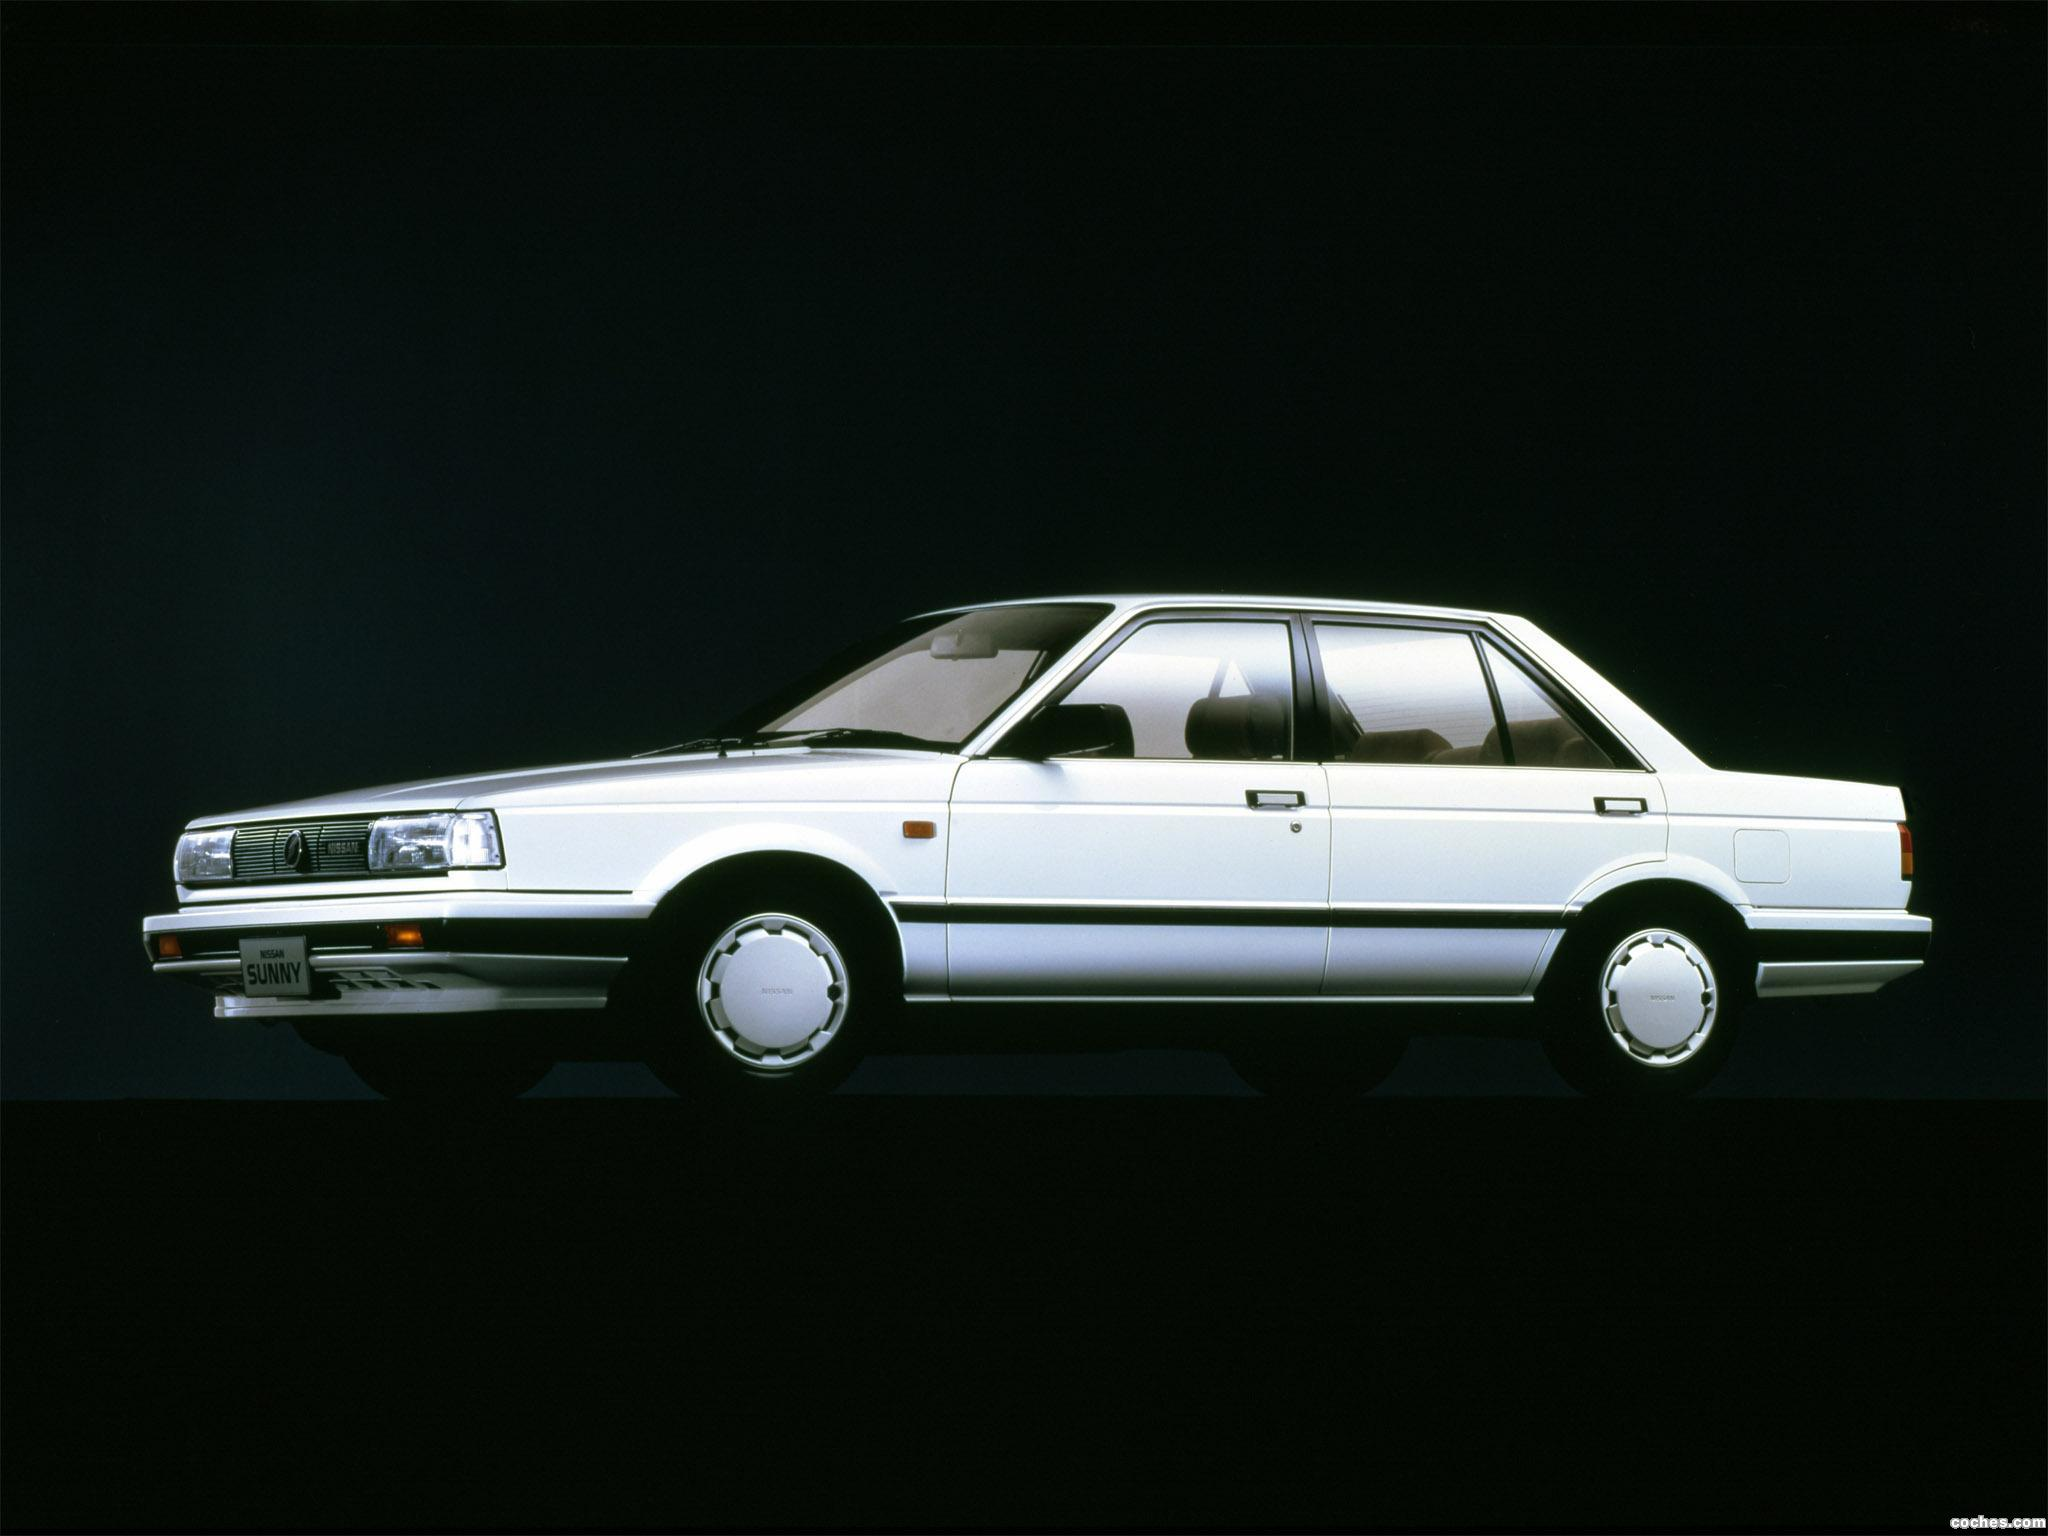 Foto 0 de Nissan Sunny SuperSaloon B12 1985